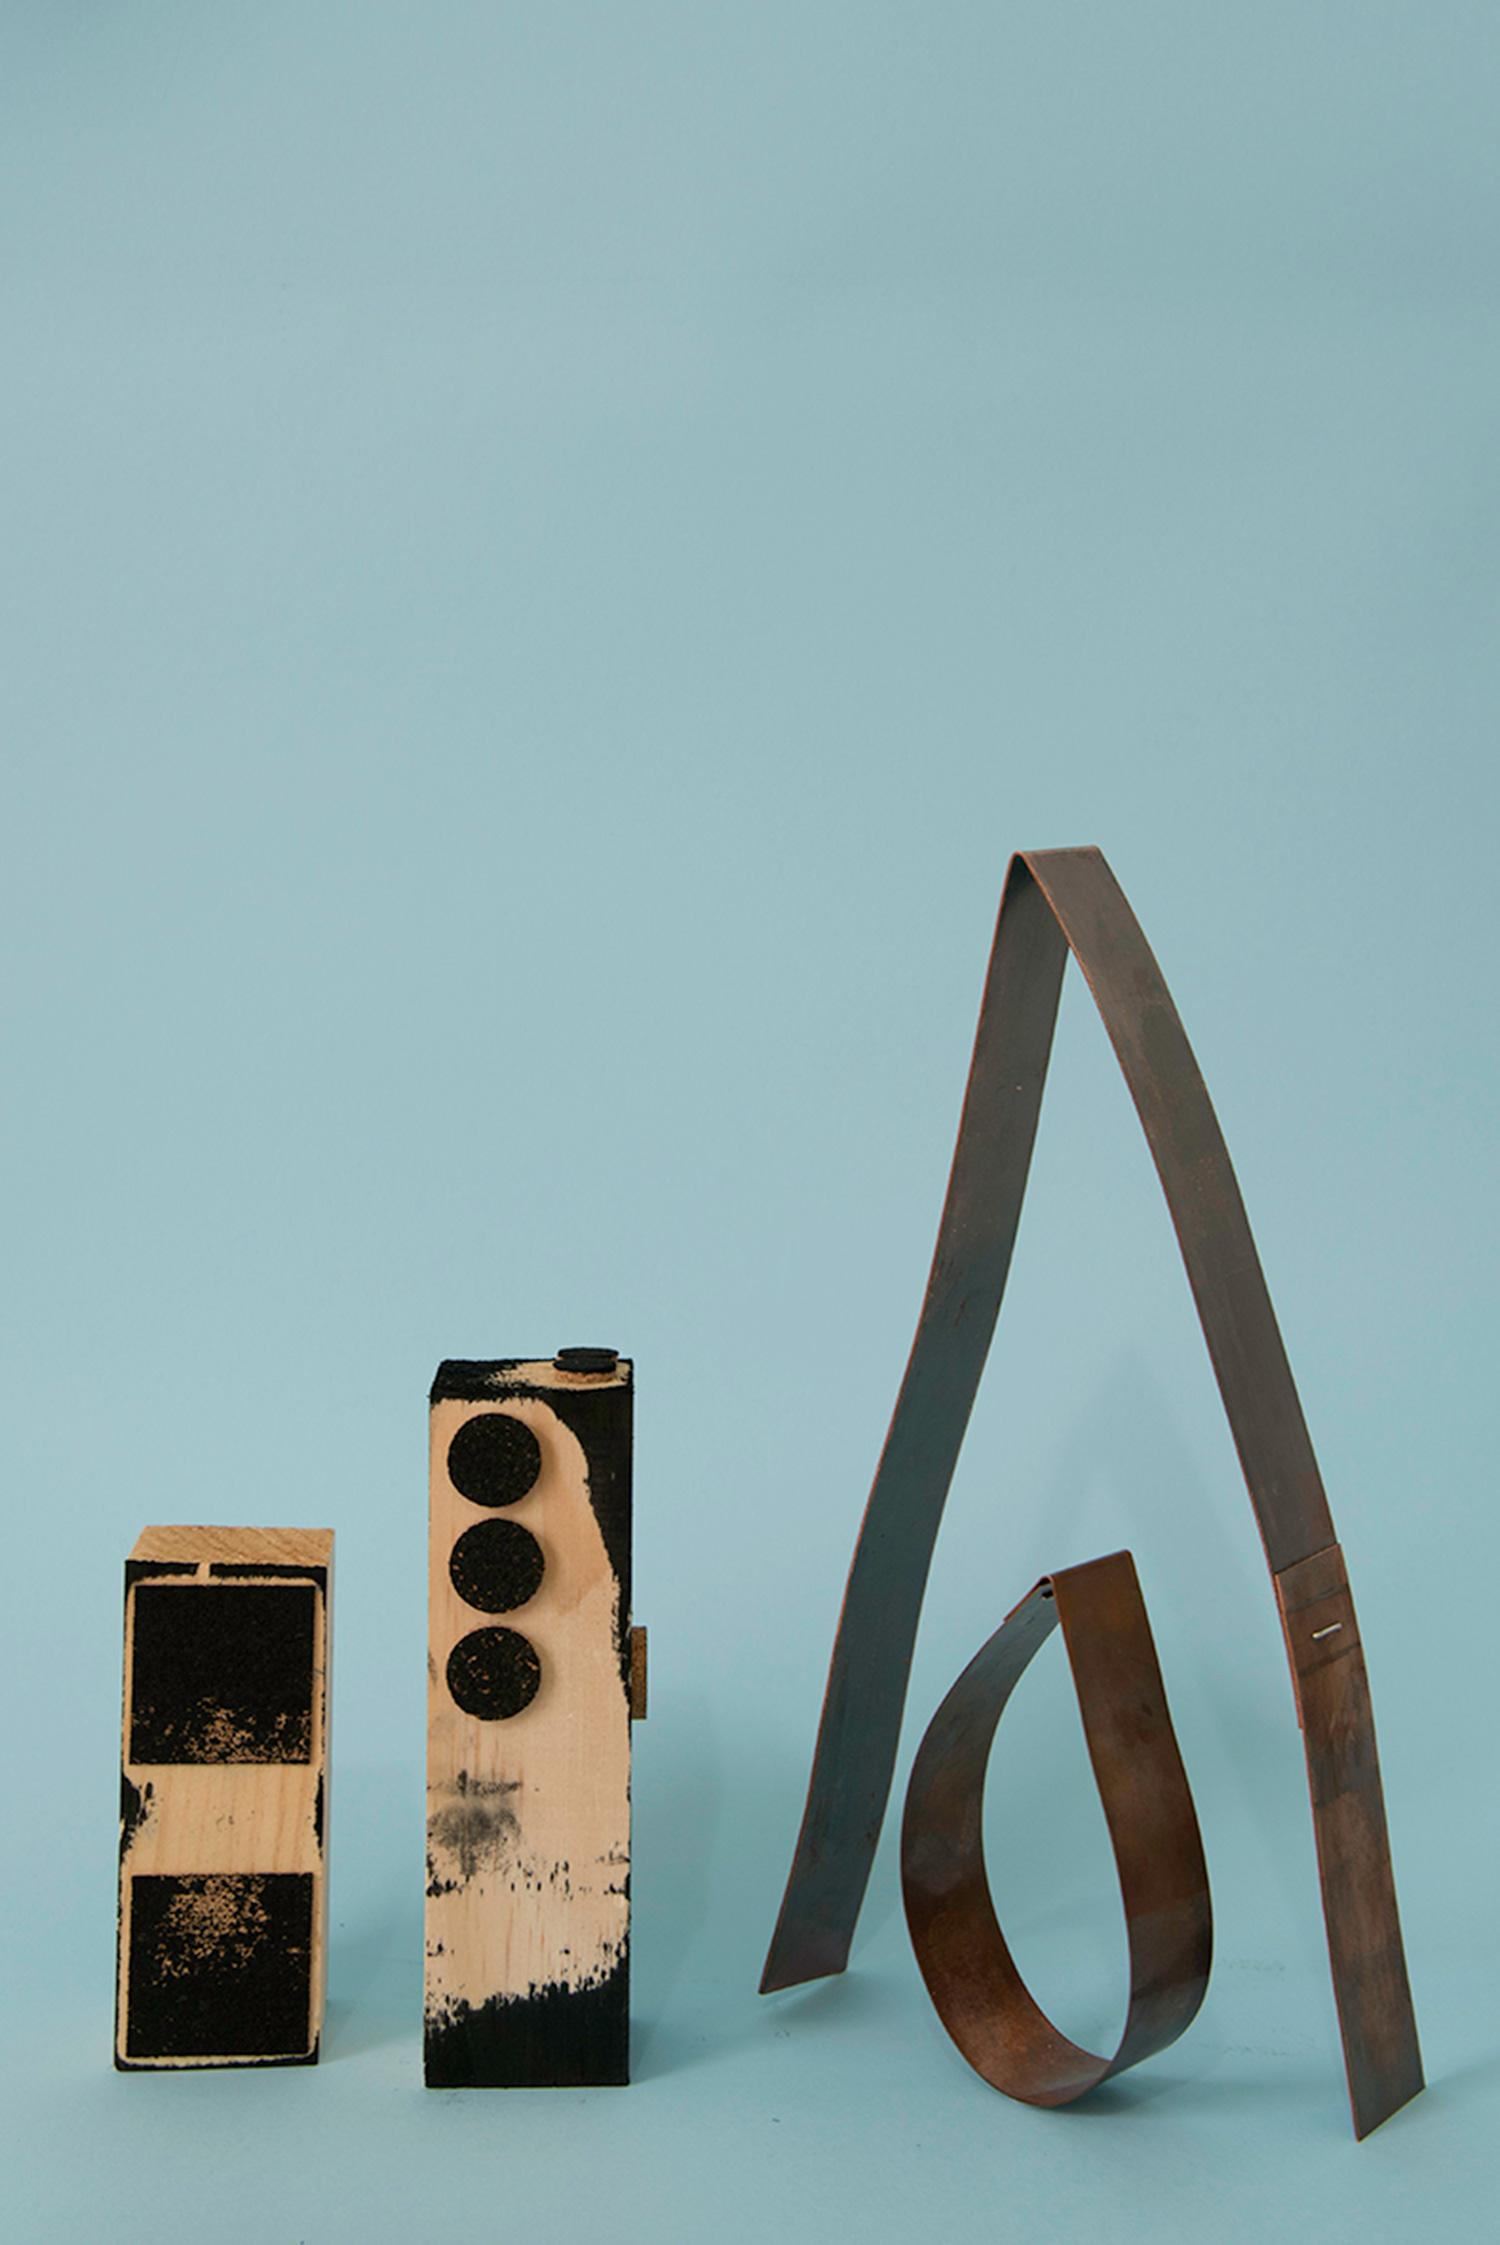 Hardbody Sculpture IV